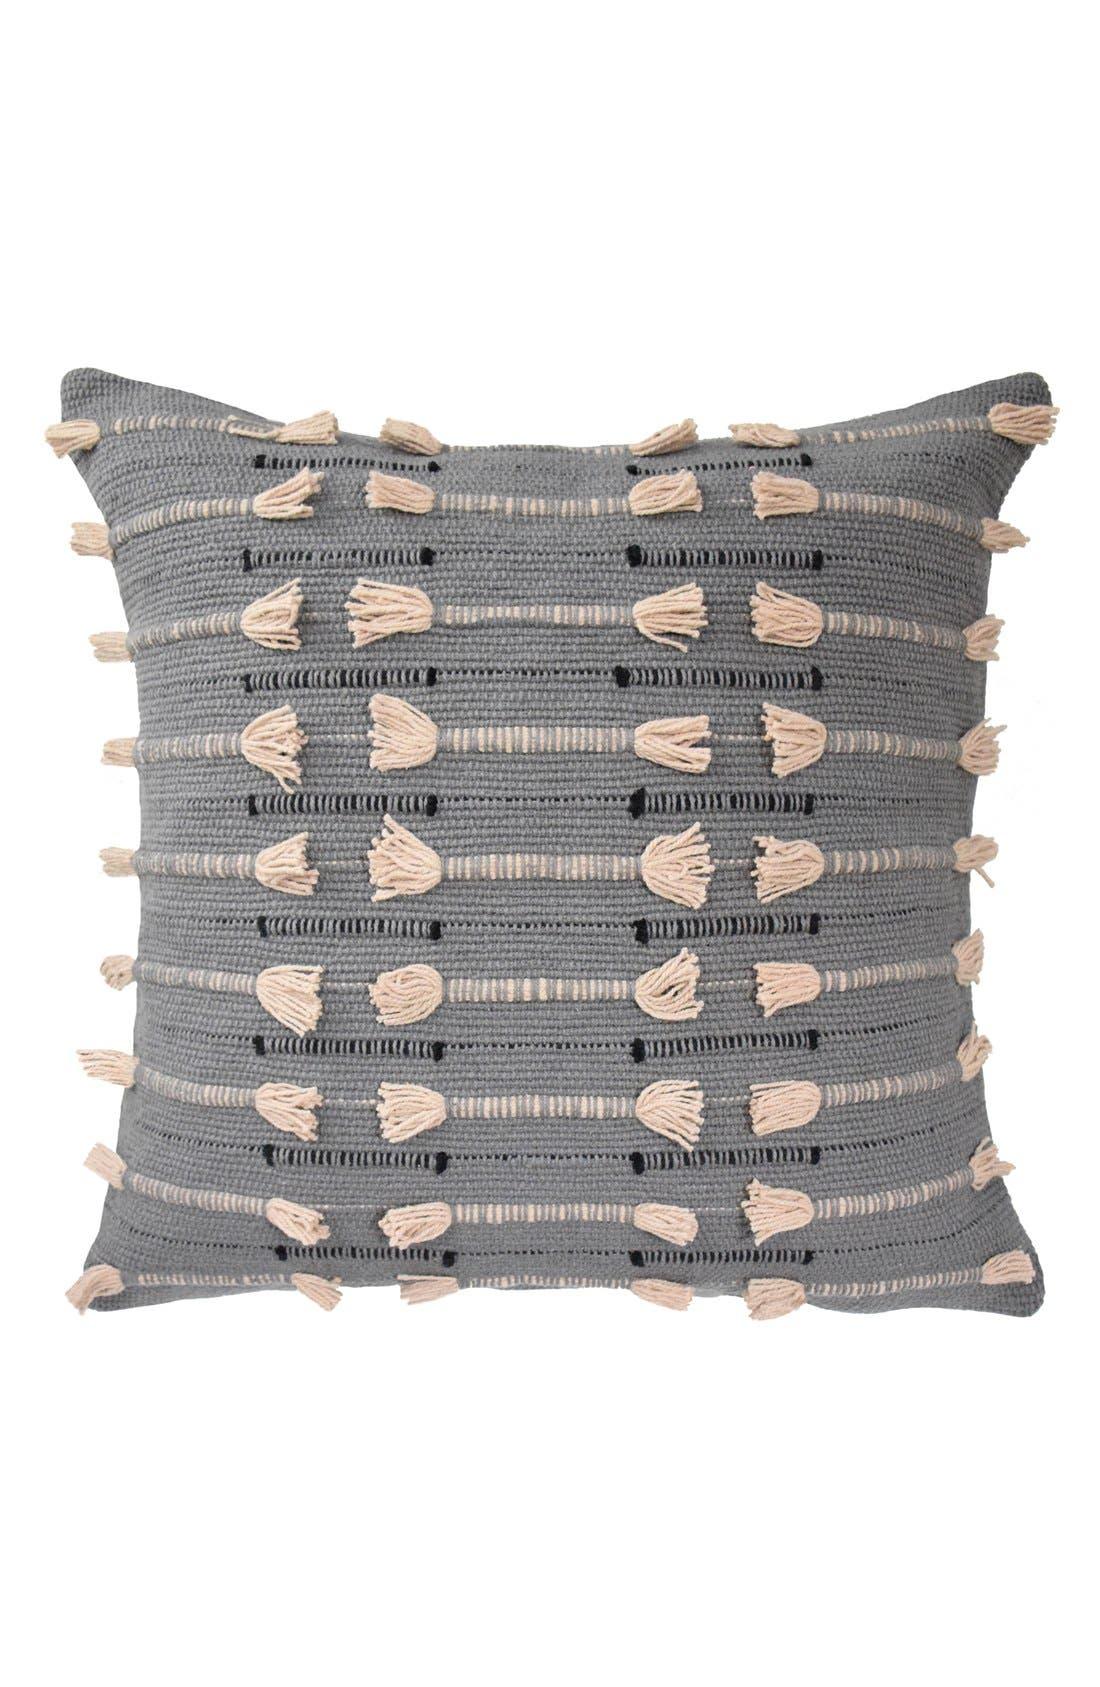 Alternate Image 1 Selected - Blissliving Home 'Vivido' Pillow